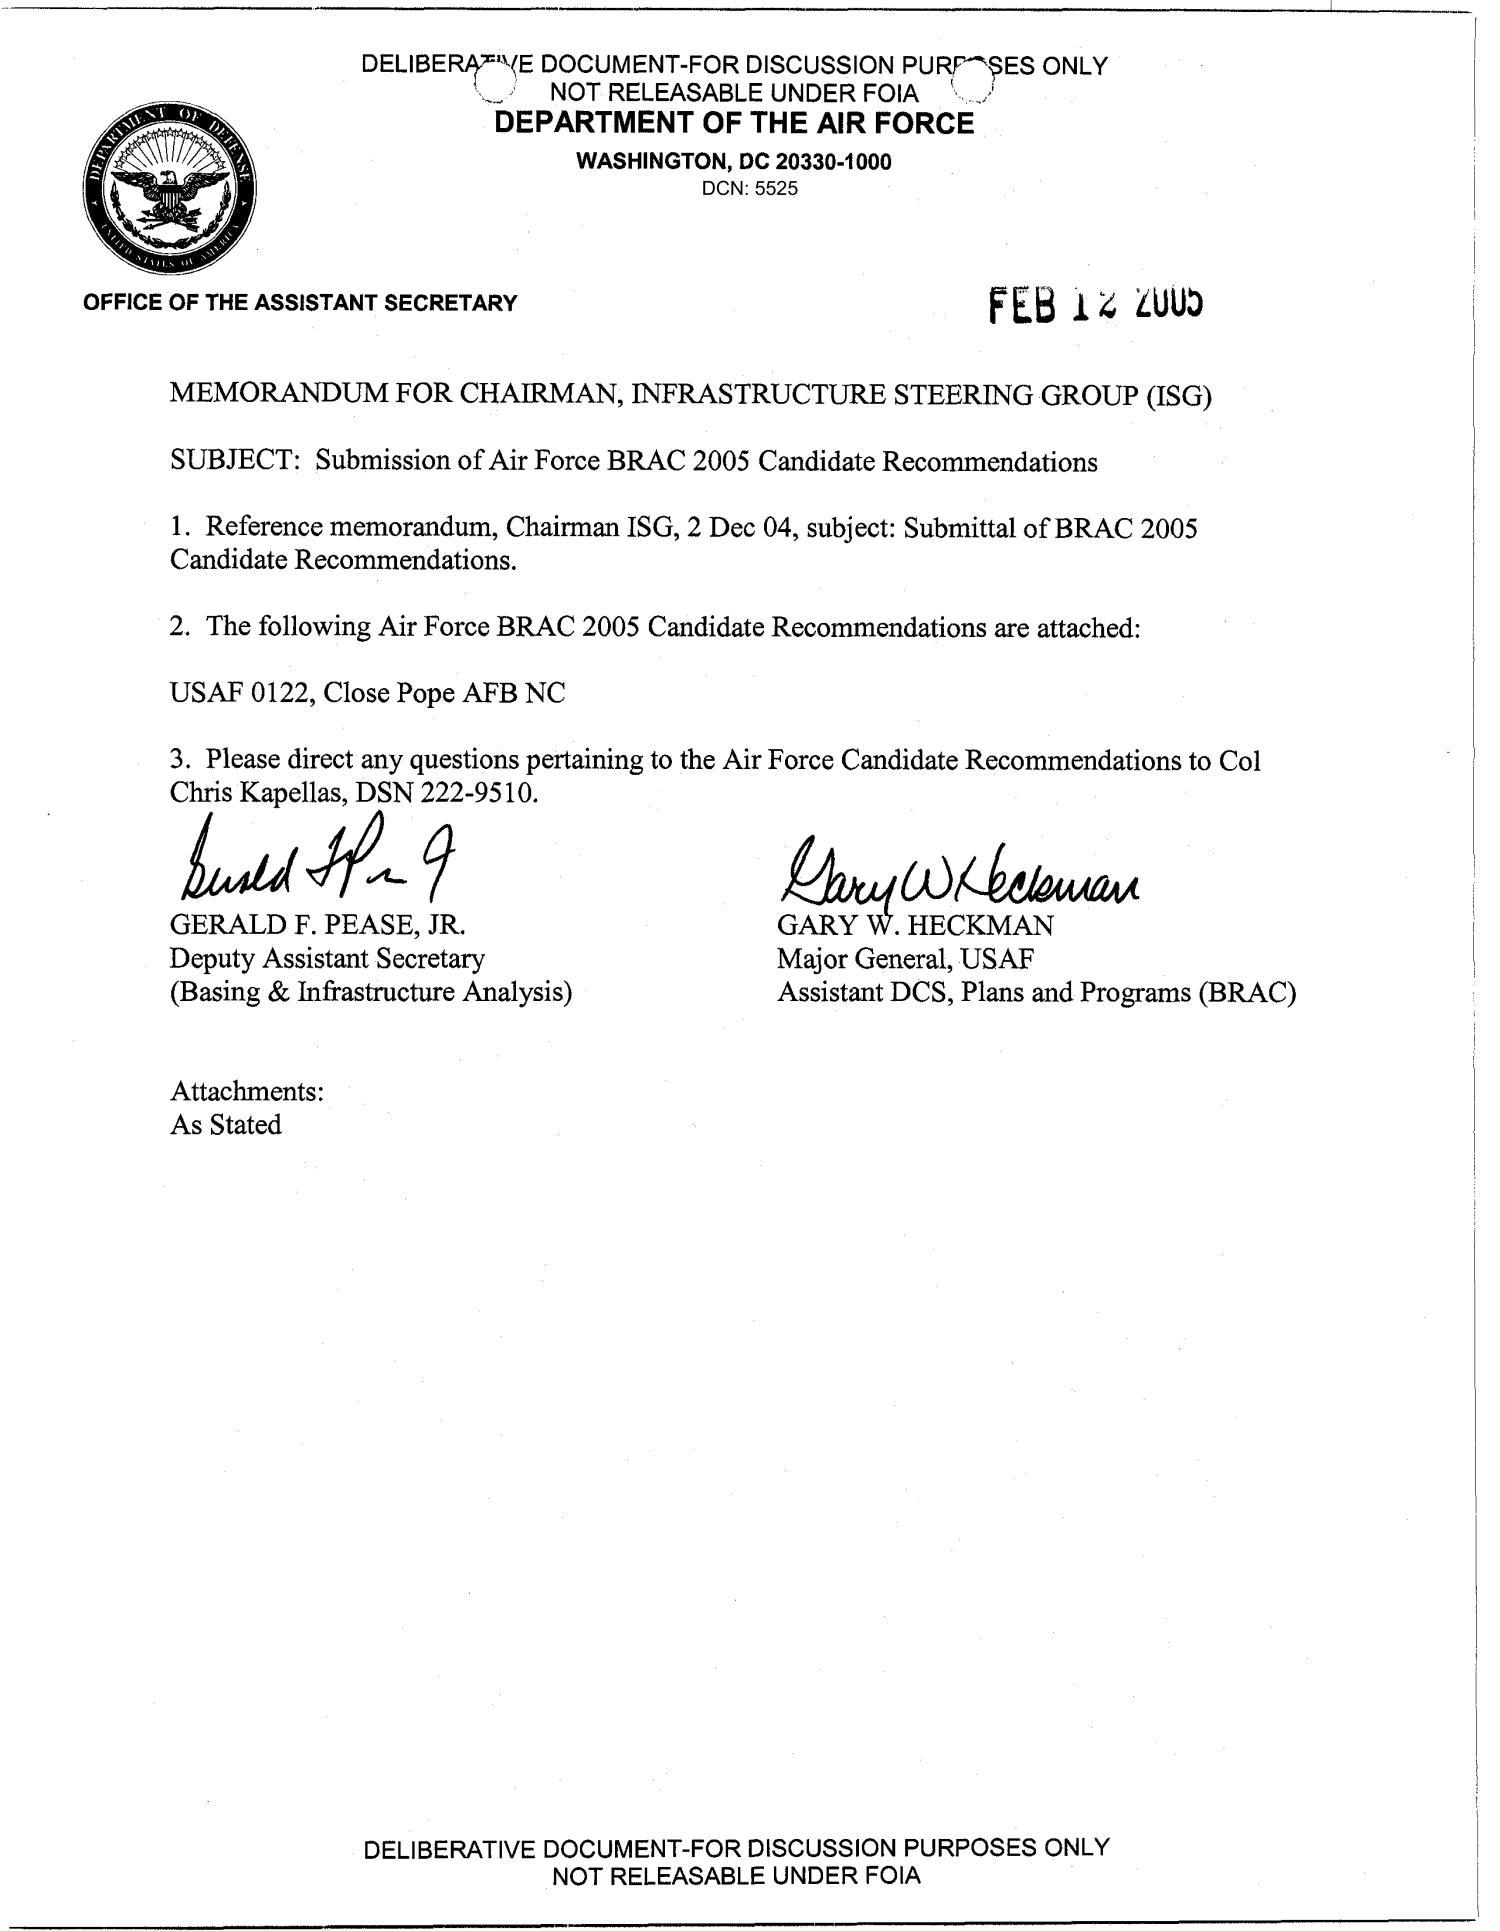 BRAC Transmittal Candidate Recommendation Letter USAF 0122  Digital Library